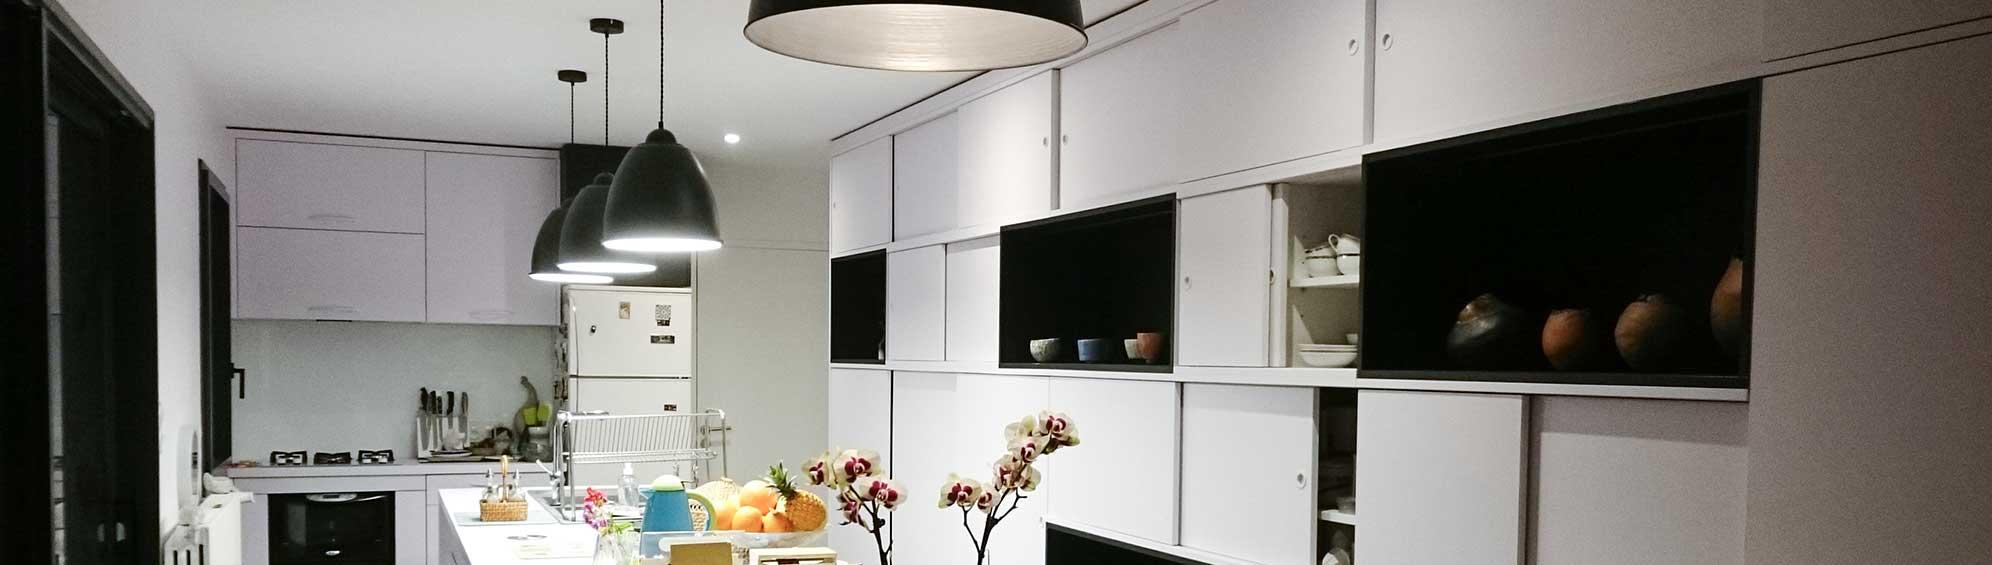 peinture-interieur-slide